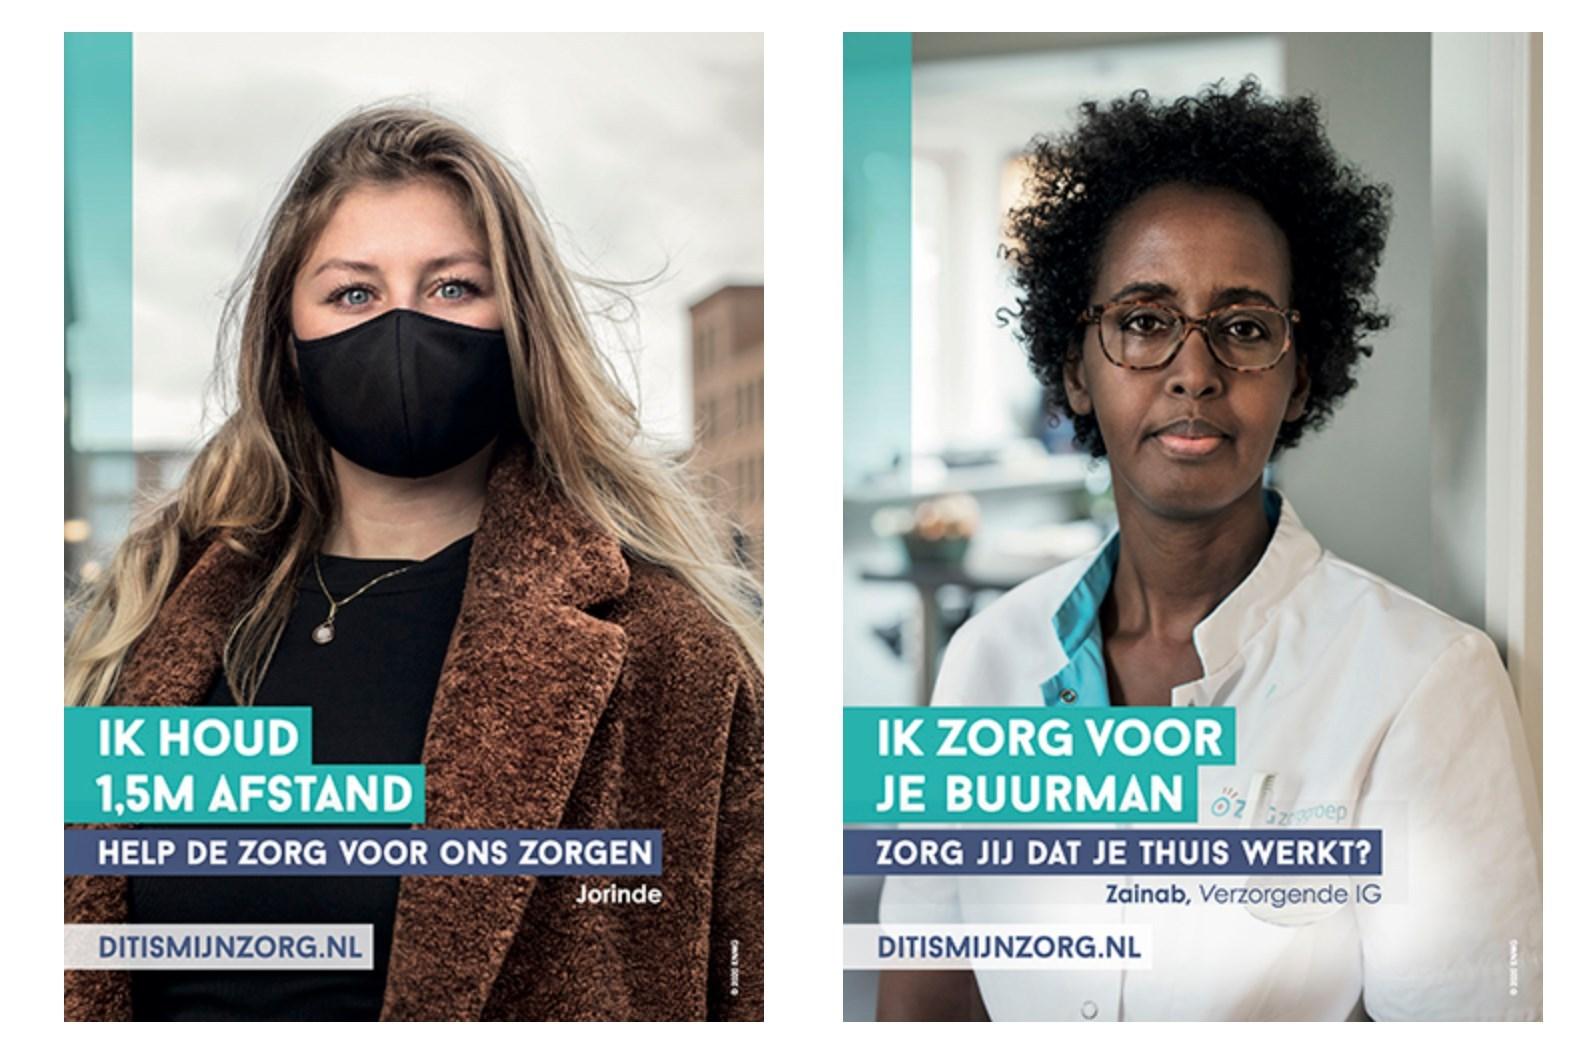 medisch-nederland-keurt-angstcampagne-knmg-en-coronamaatregelen-af!-–-cstv